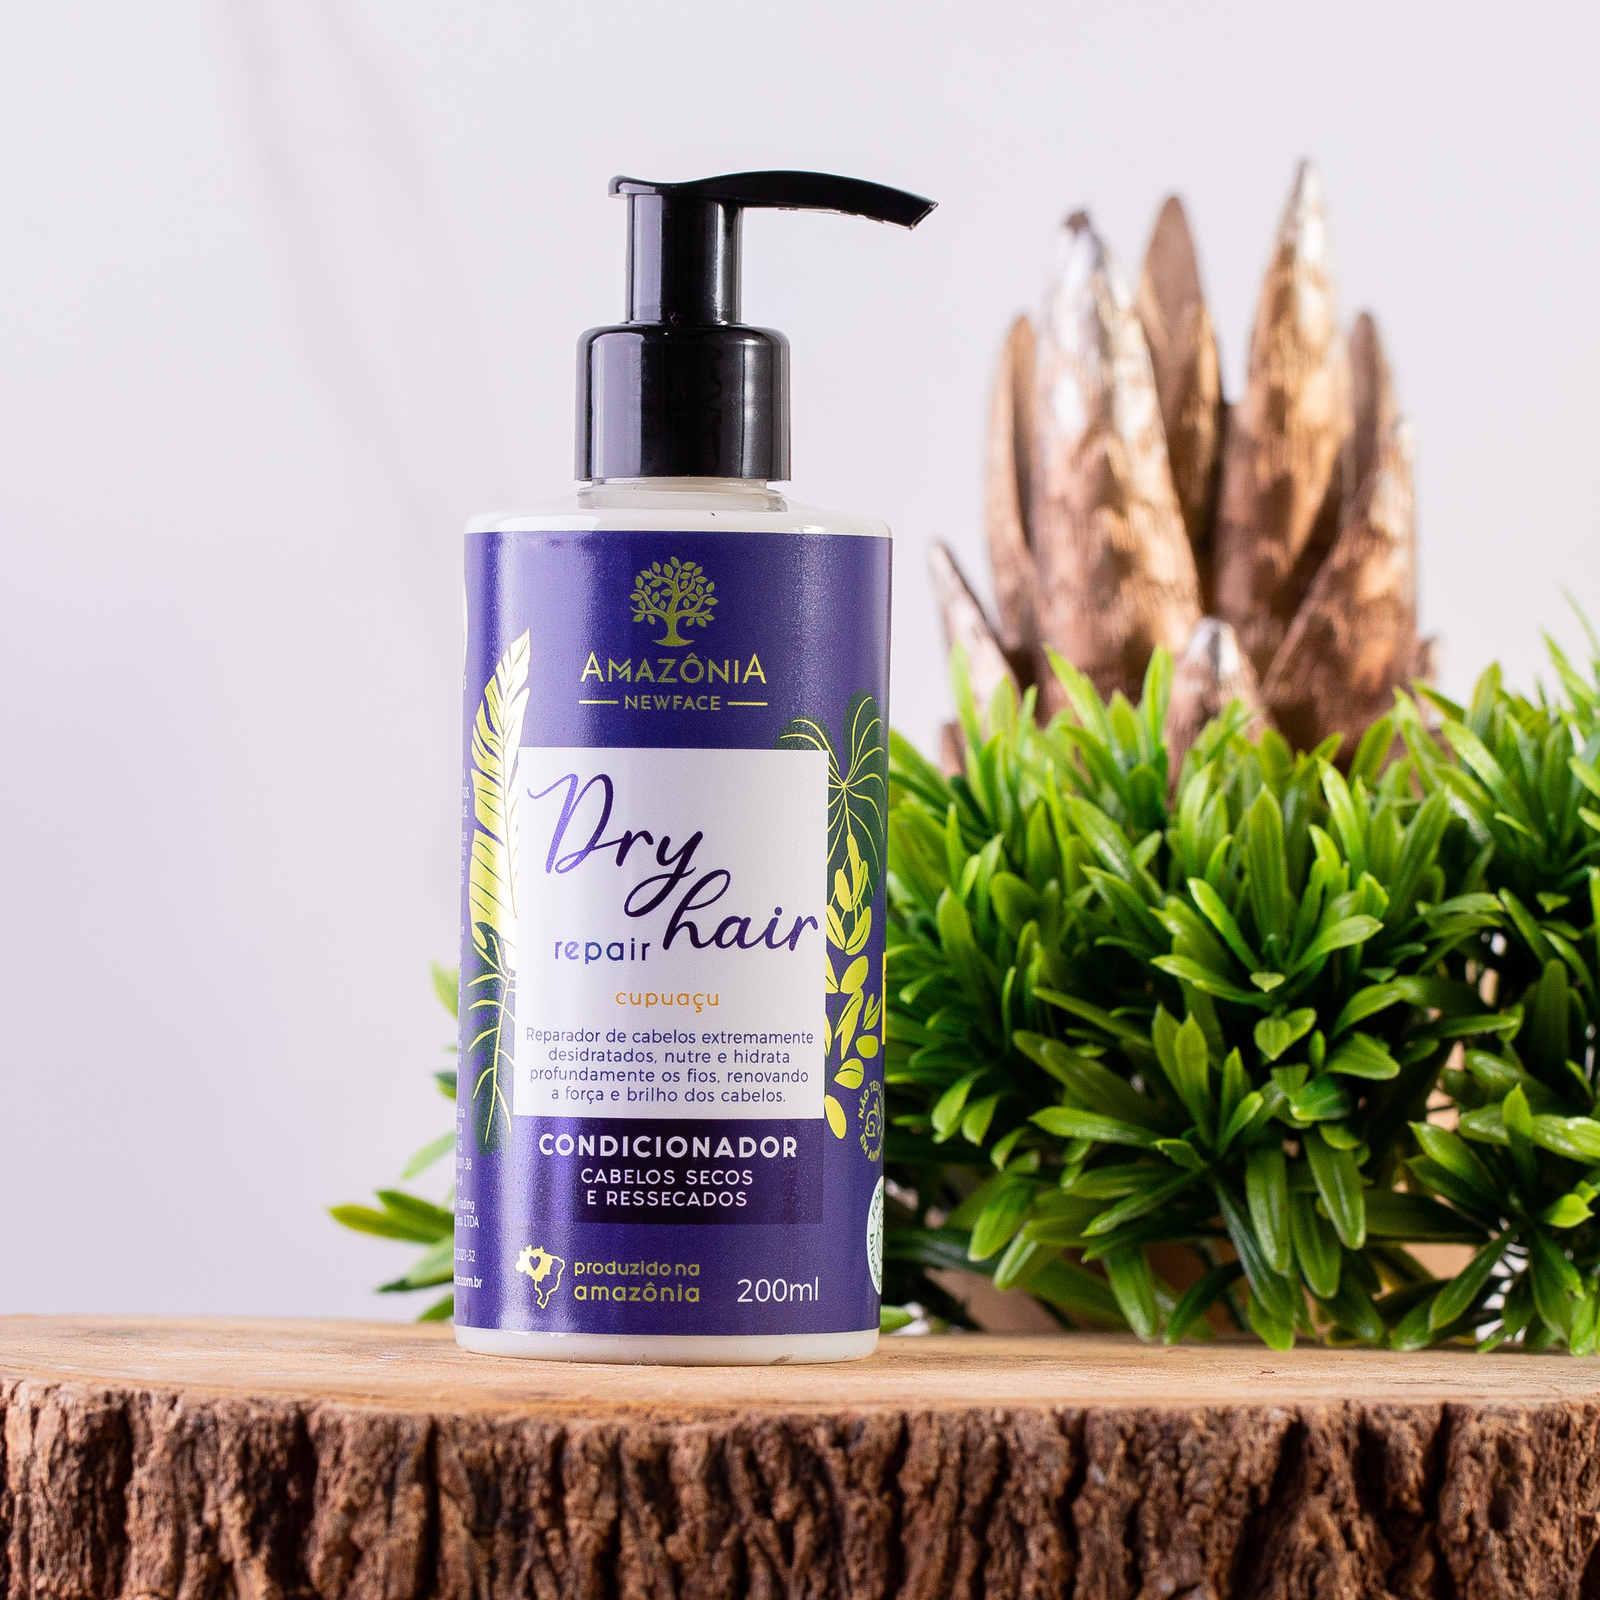 Condicionador Dry Hair Repair